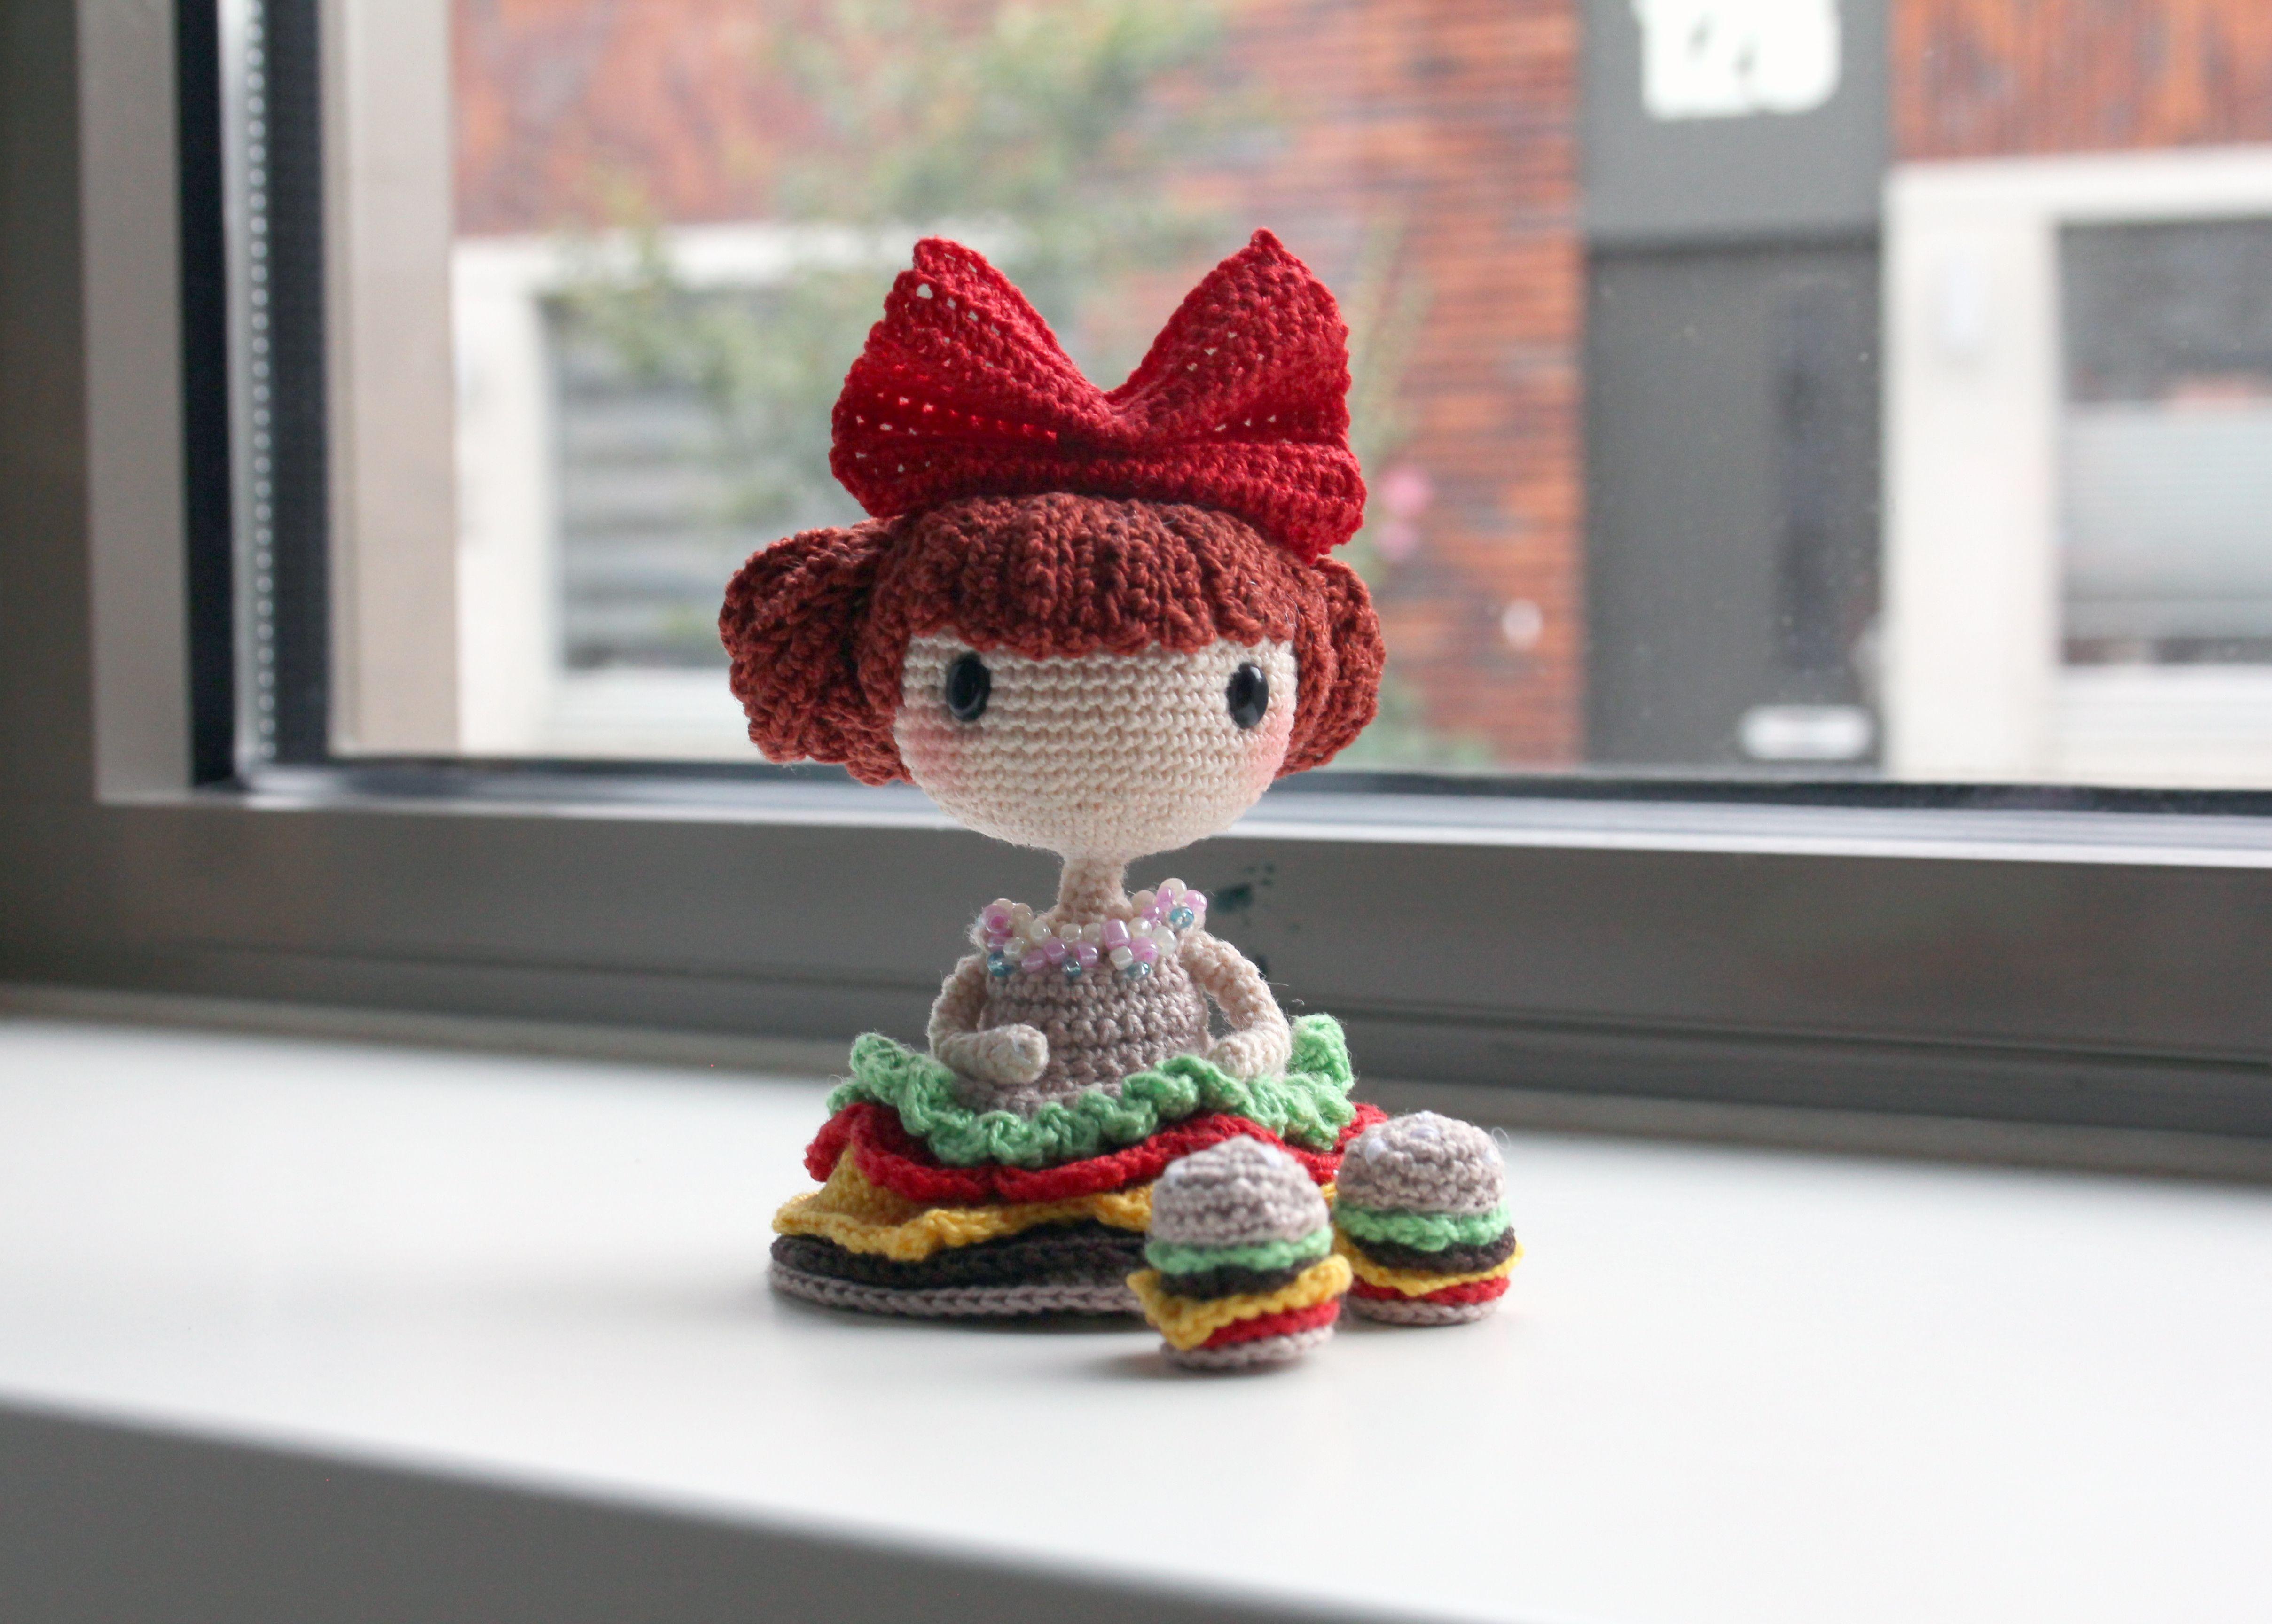 Amigurumi Doll Anime : Lily the hamburger ❤ one of the shia dolls amigurumi crochet